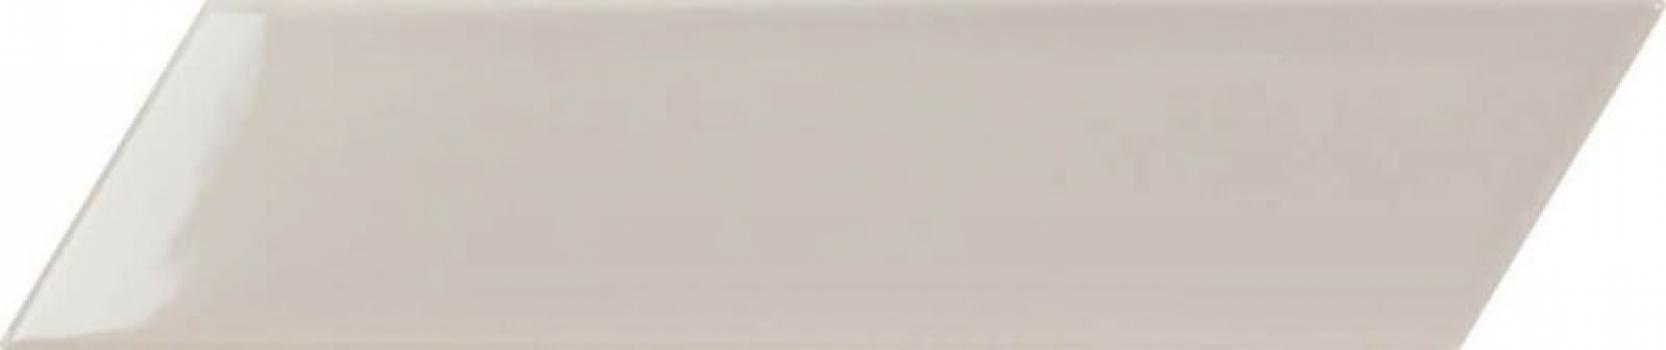 плитка настенная chevron tiramisu left 6,4x26 см CEVICA Tiramisu Left